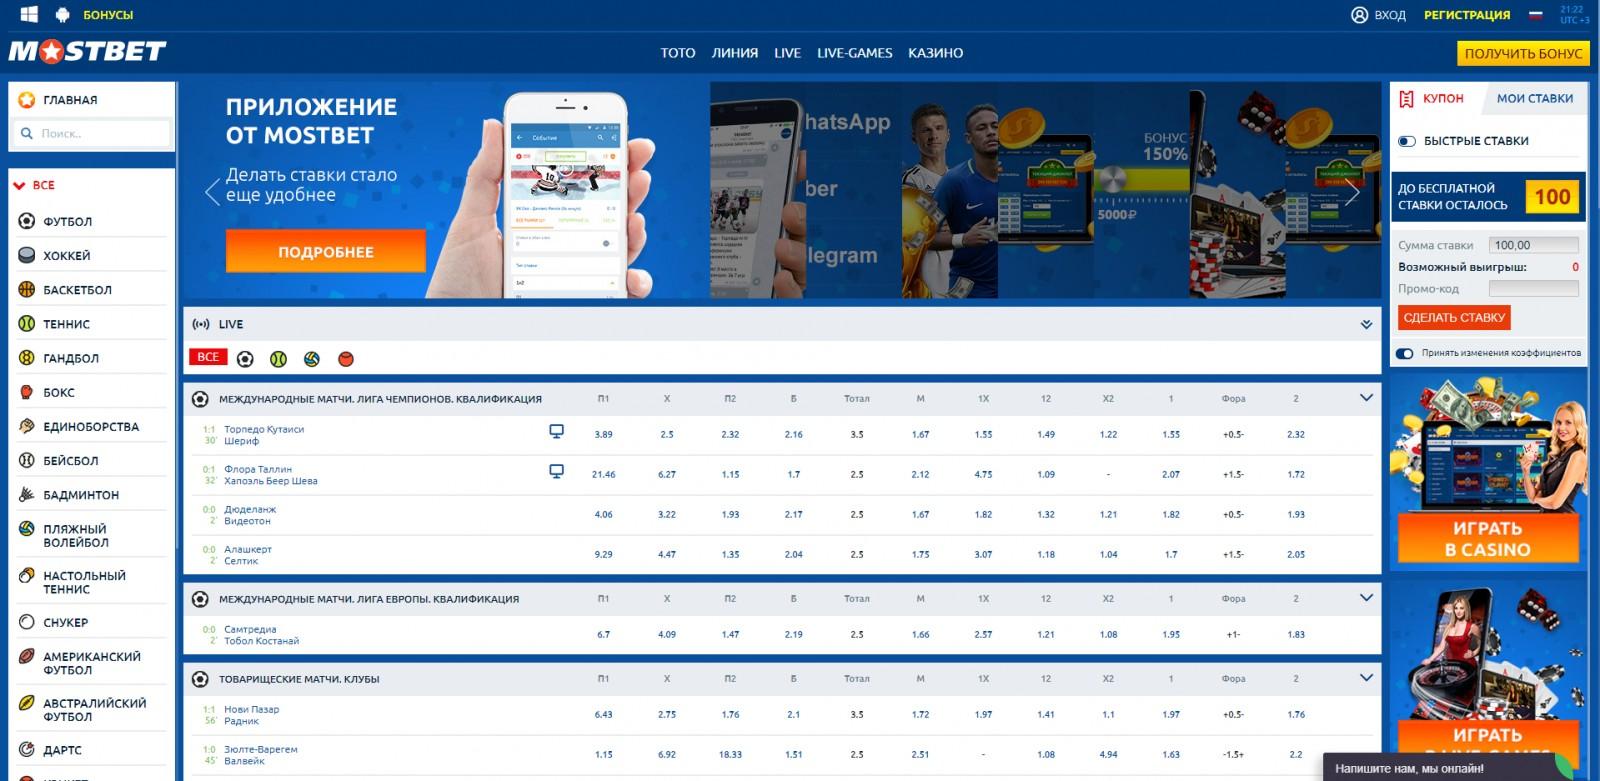 mostbet-website.png